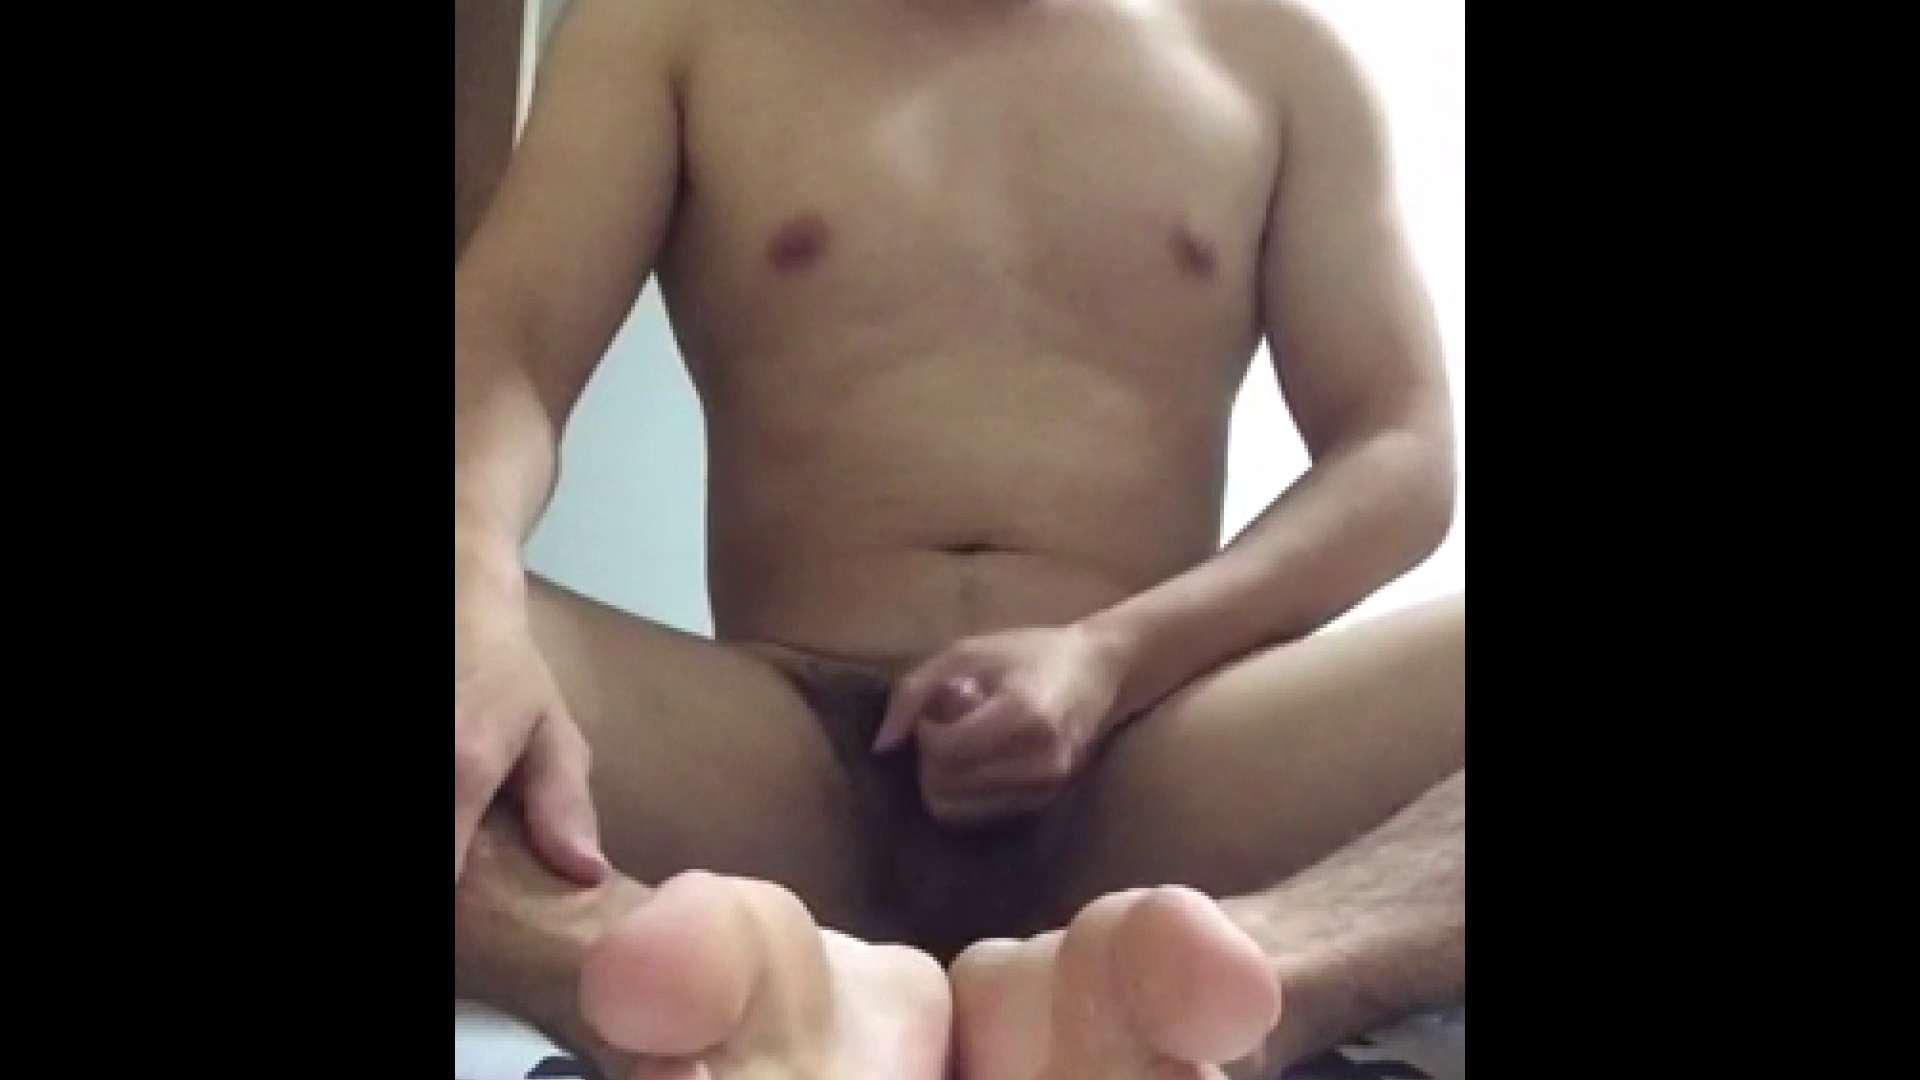 個人撮影 自慰の極意 Vol.34 無修正 ゲイ無修正動画画像 64pic 29